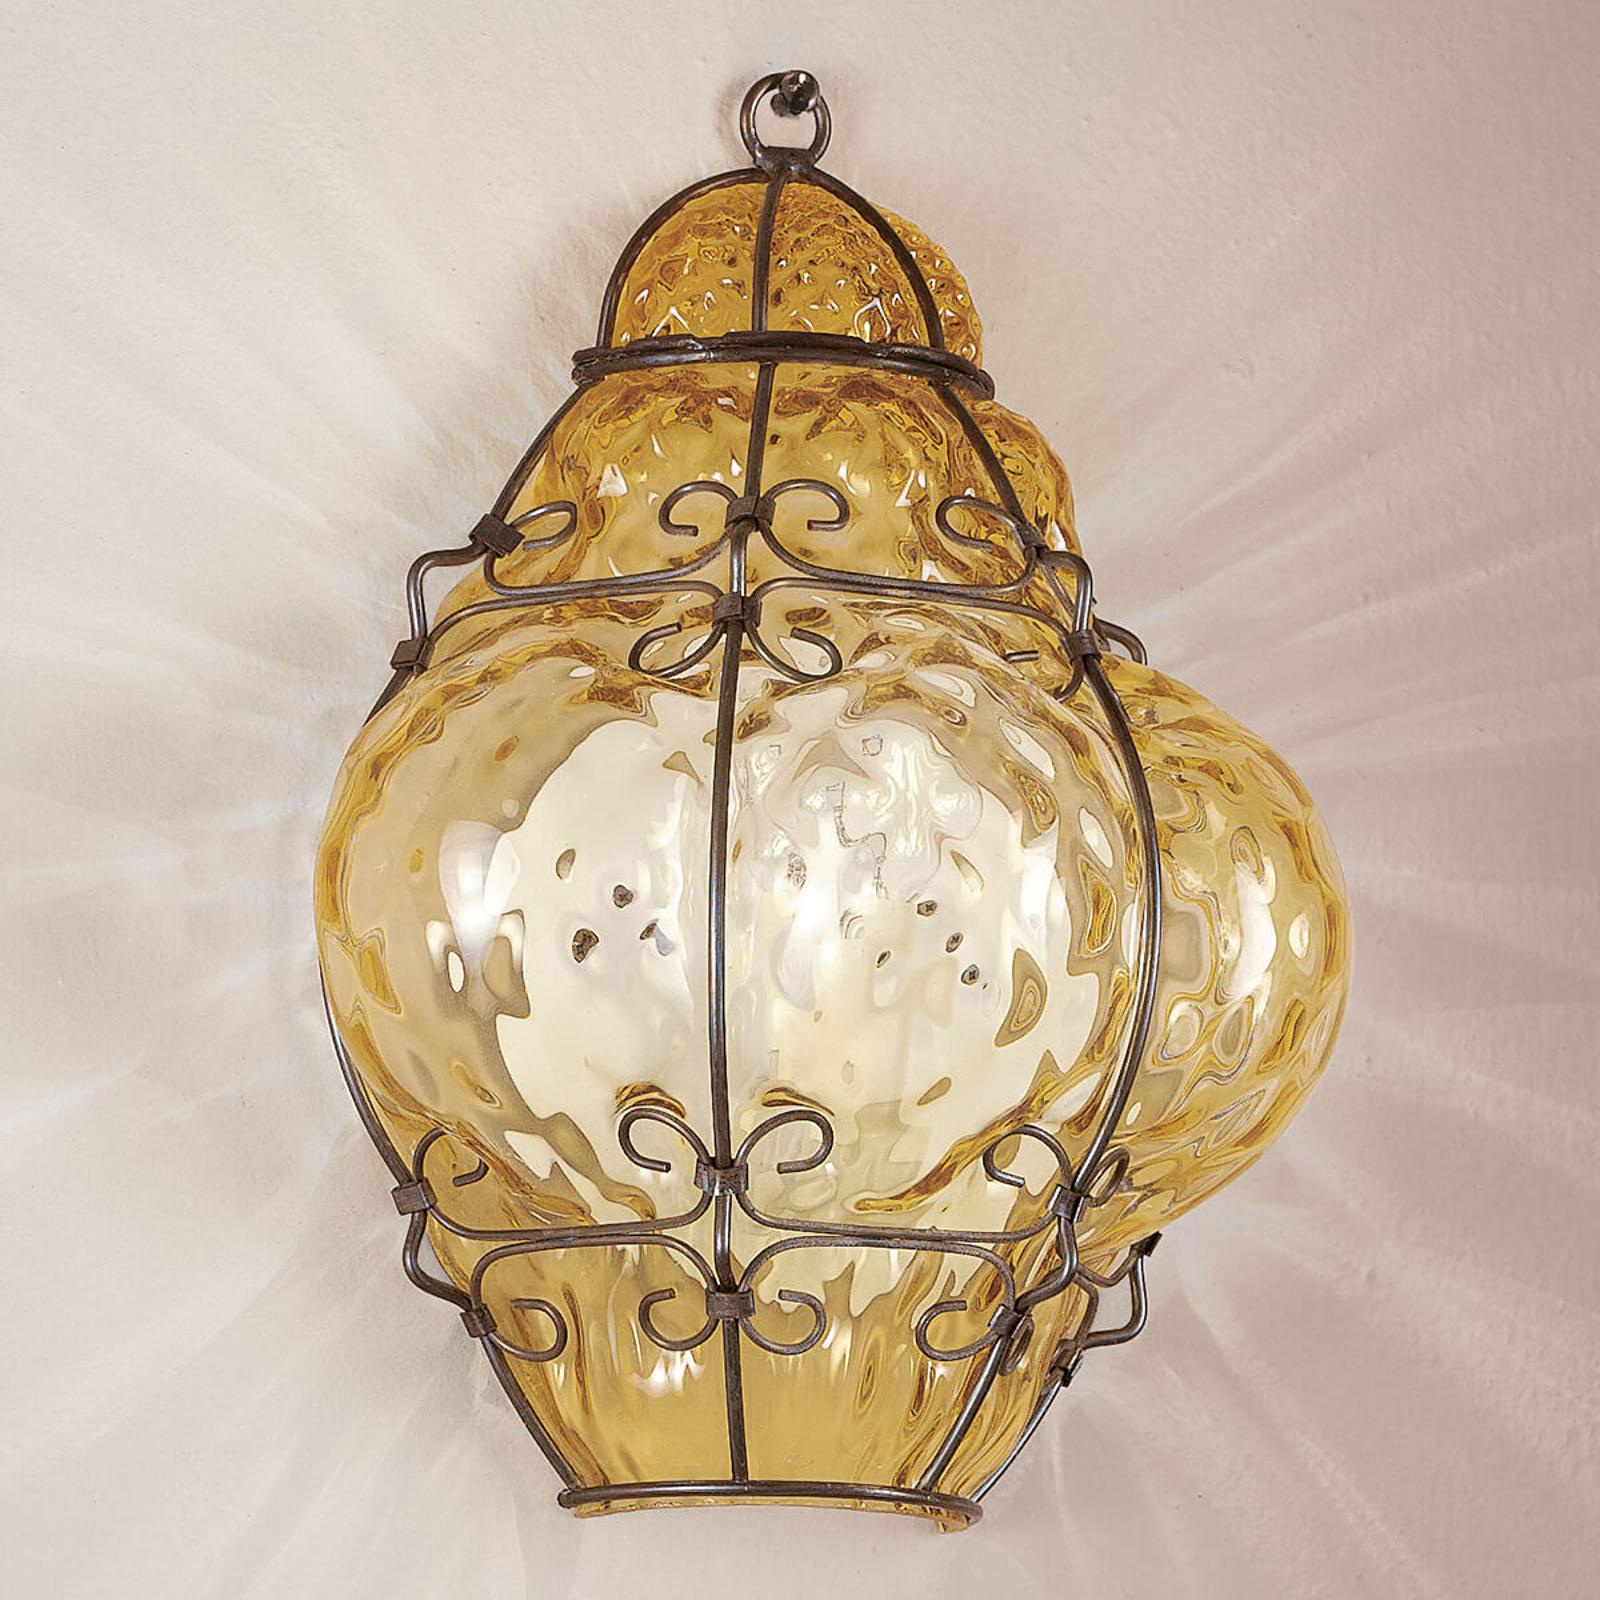 Vegglampe Classic munnblåst, rav